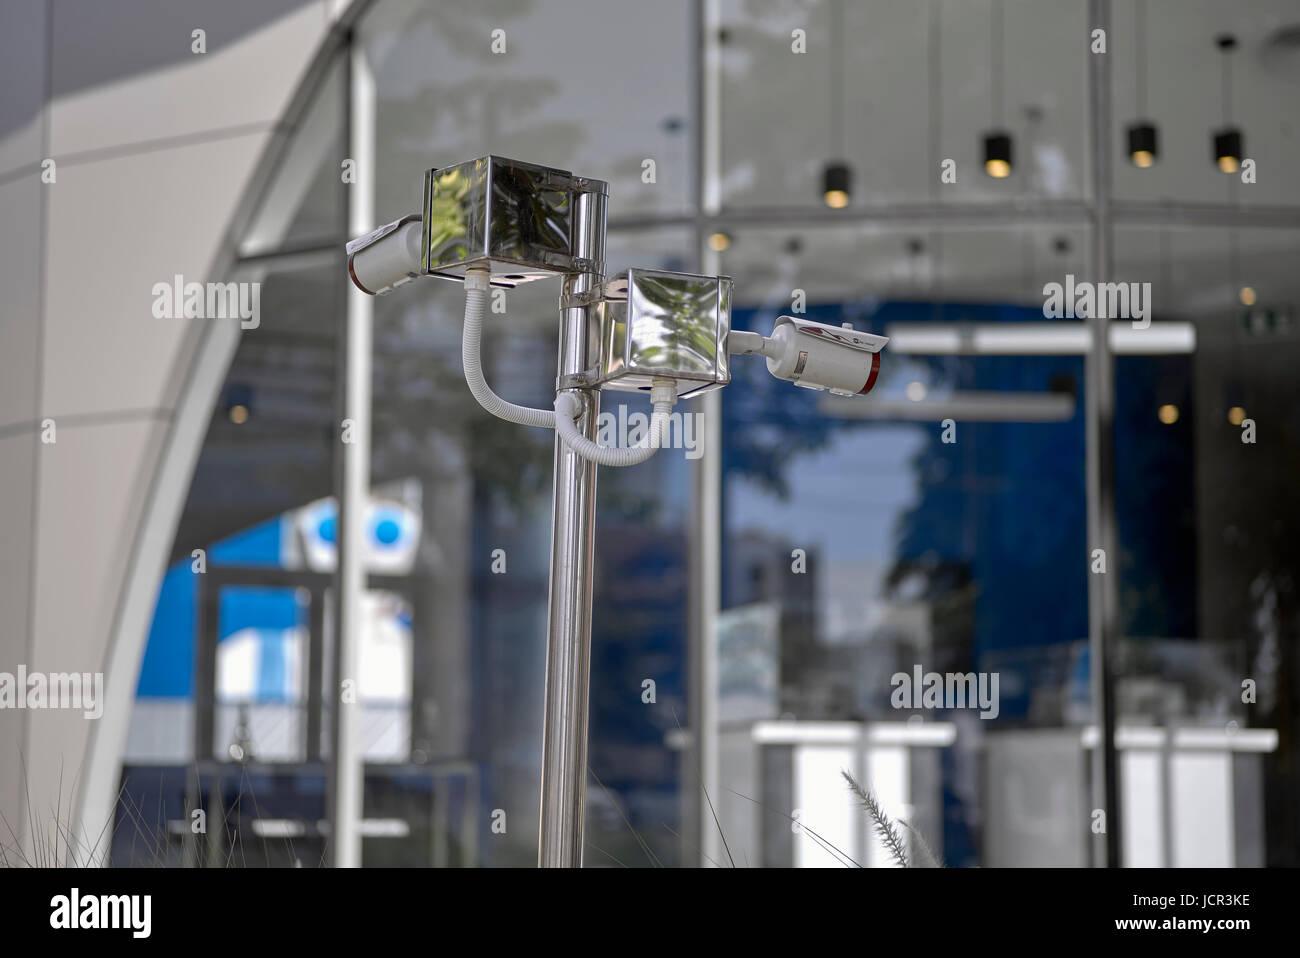 CCTV surveillance camera Stock Photo